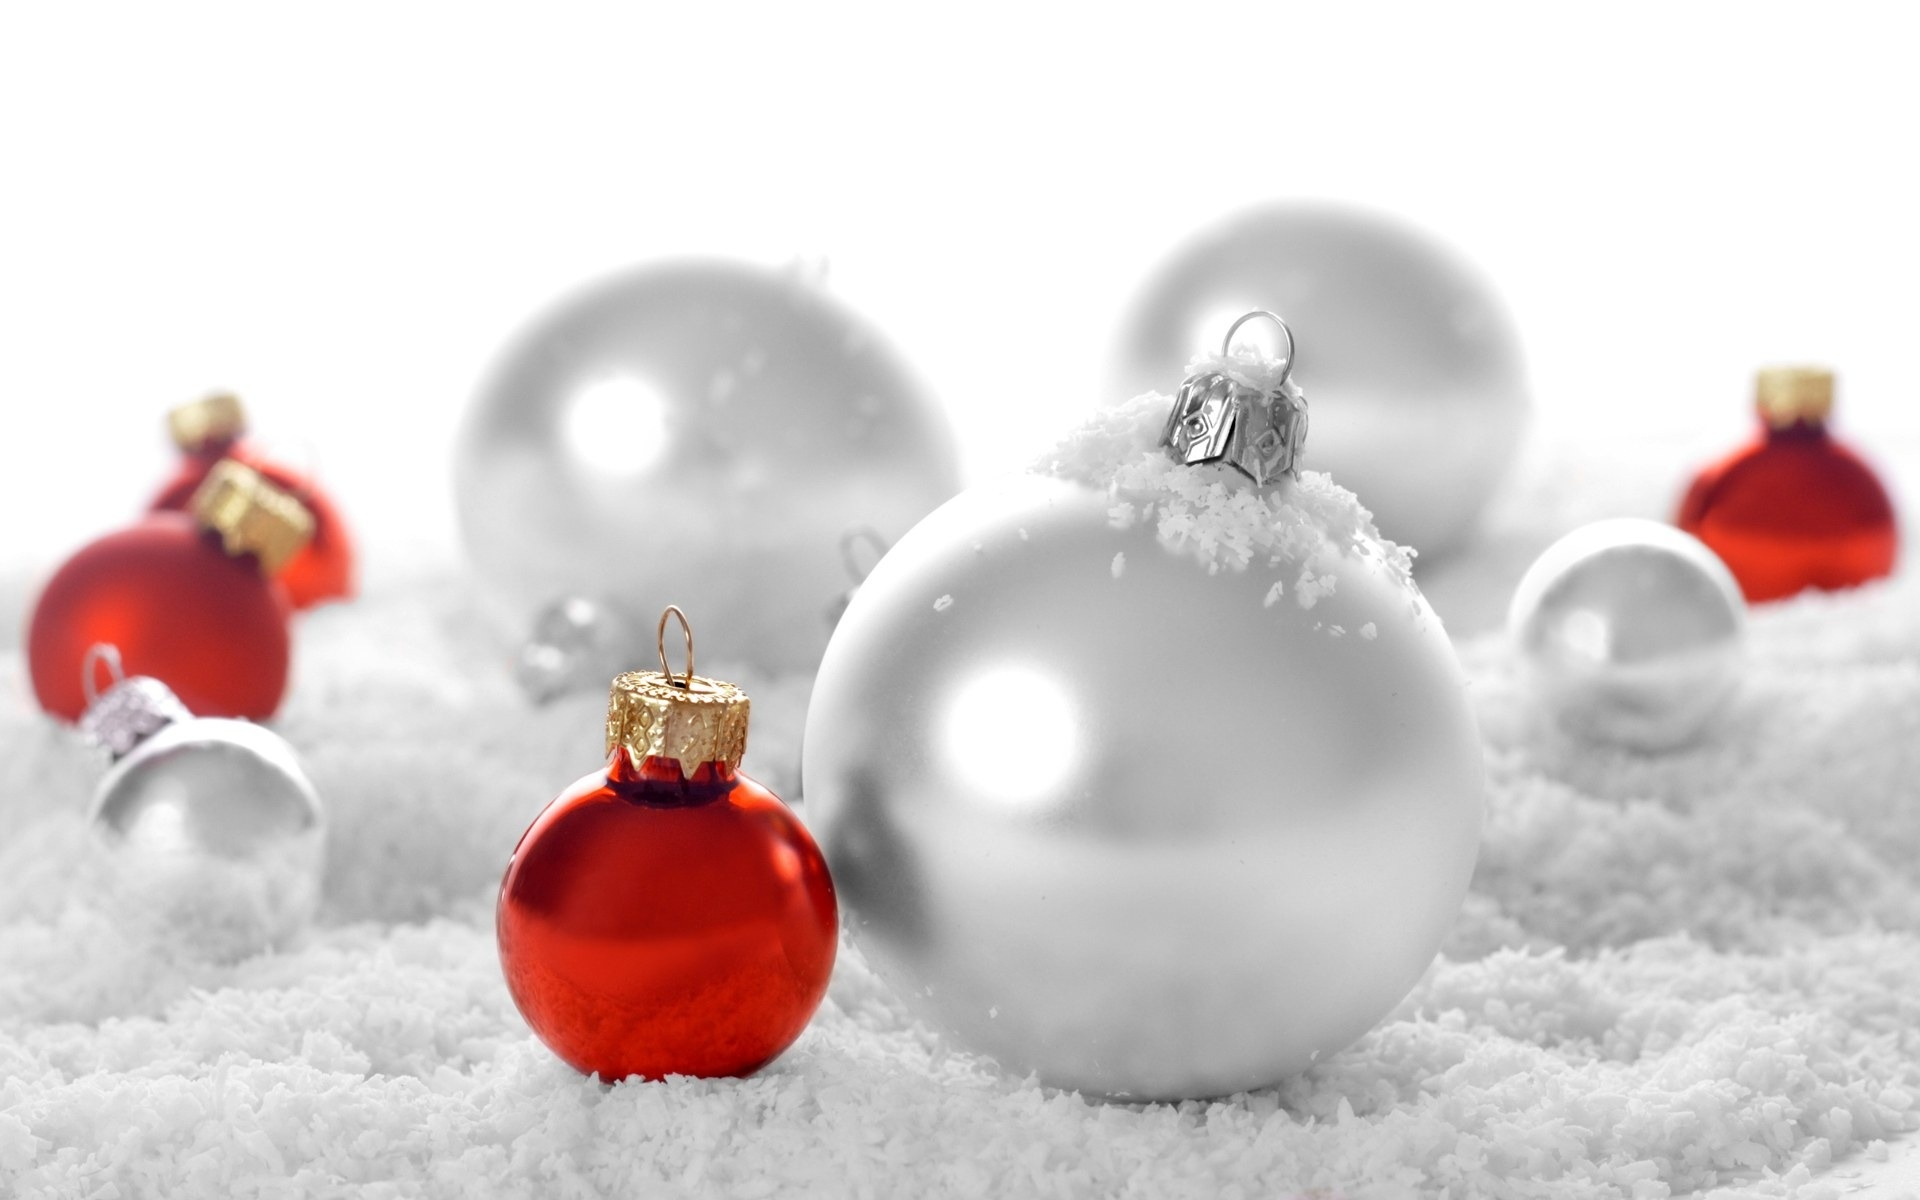 free christmas ornaments wallpaper 38737